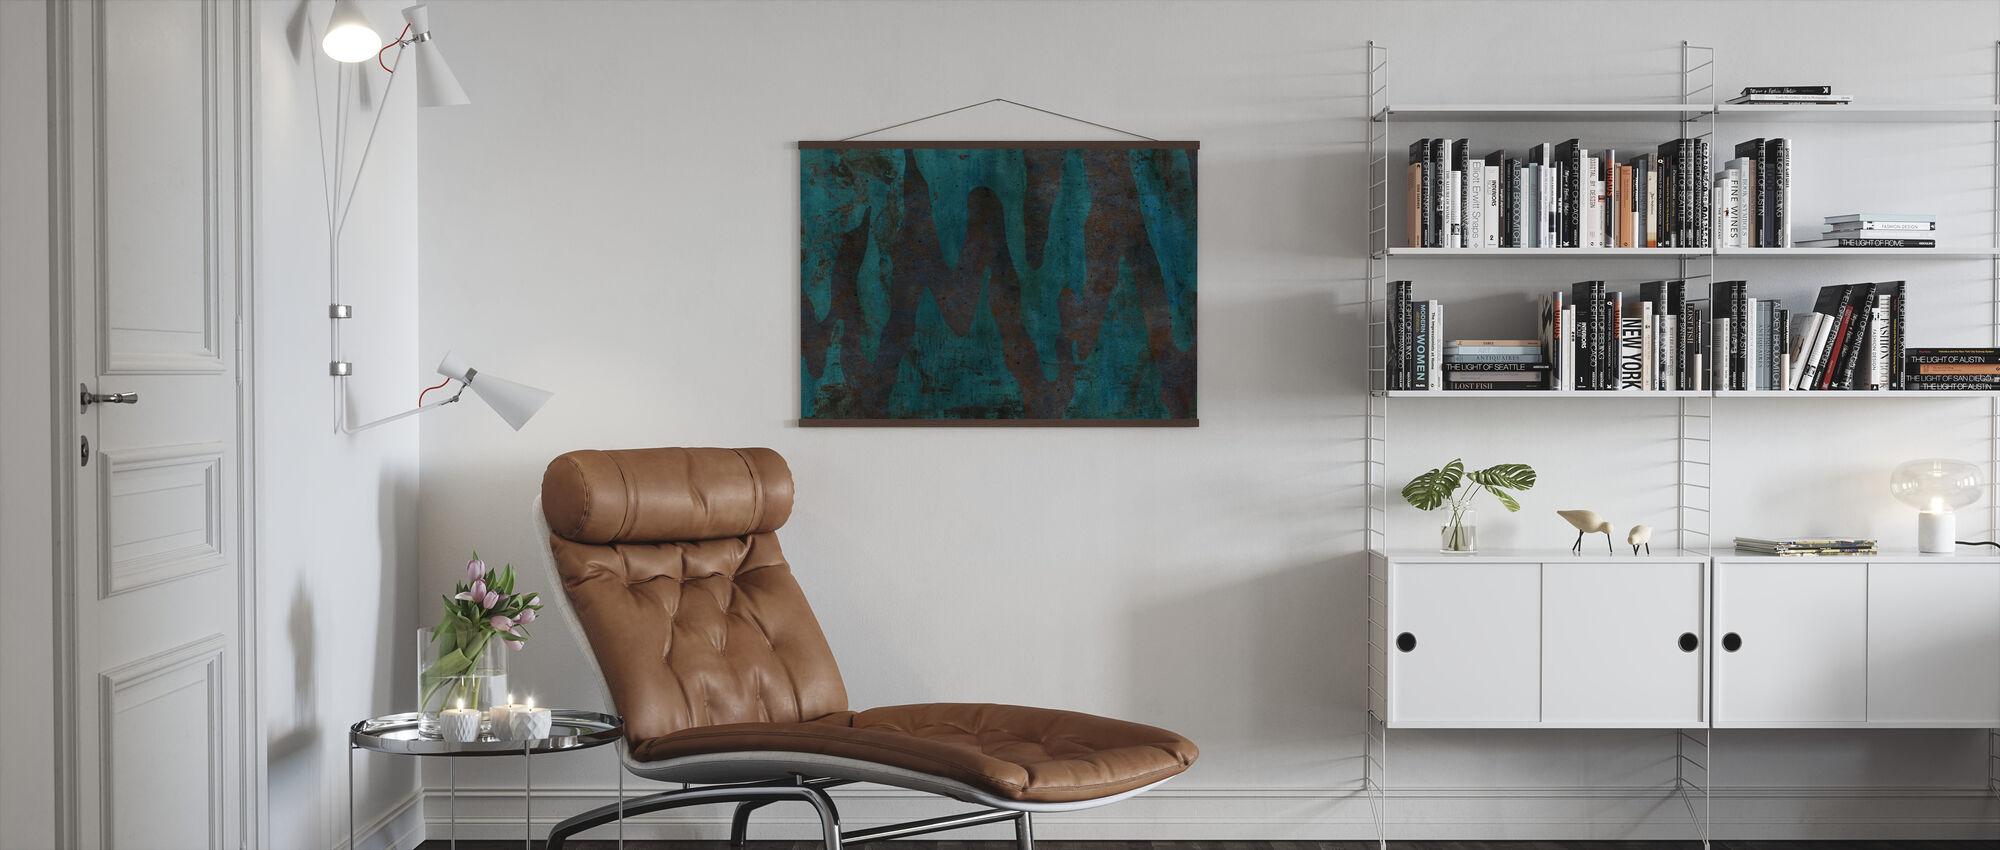 Aracio - V - Poster - Living Room